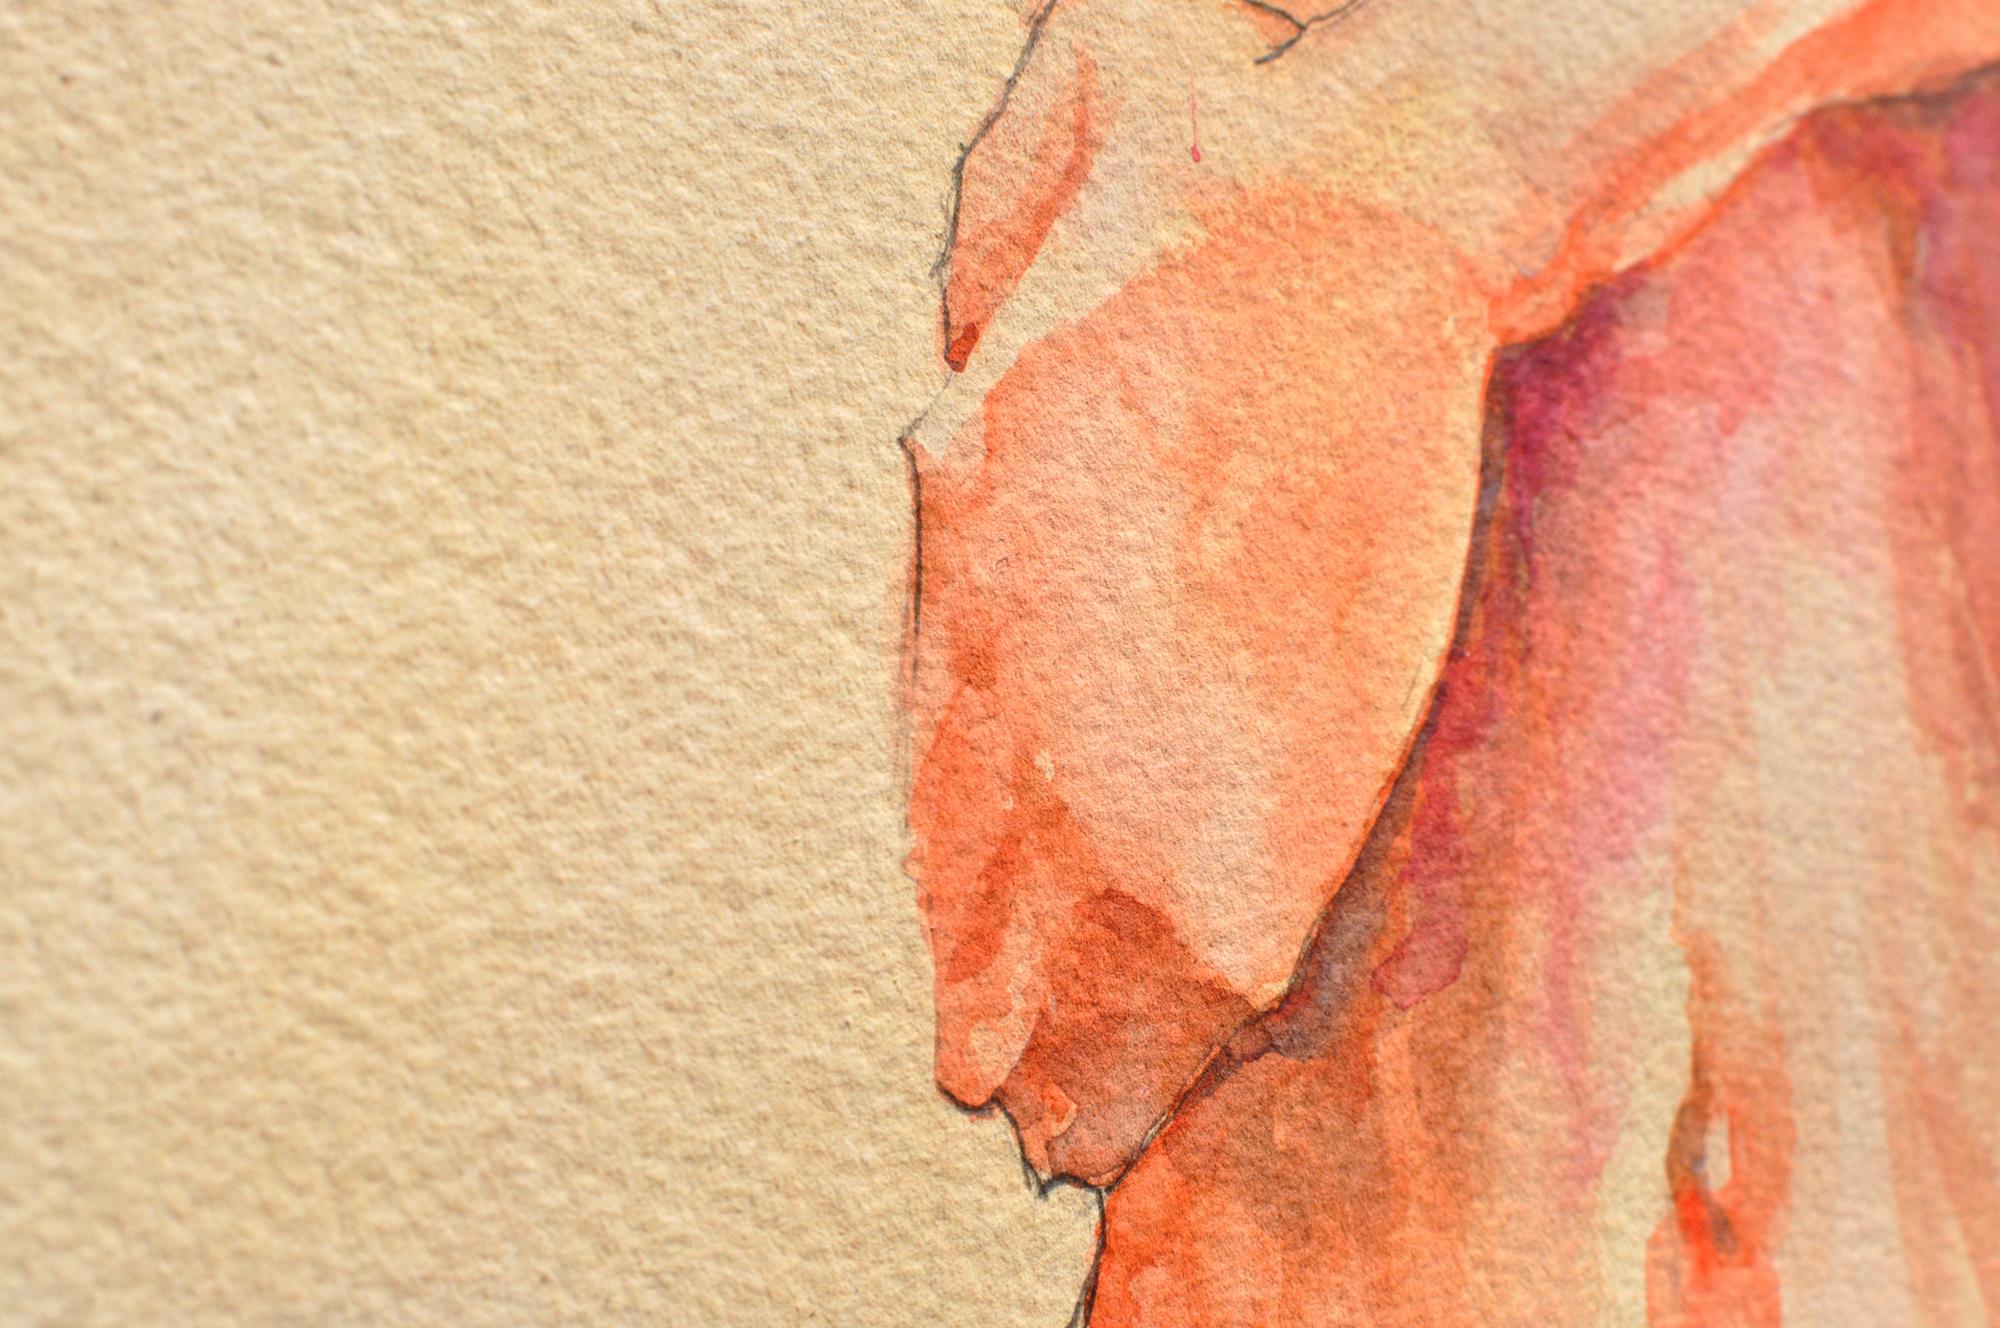 deathbed_selfportrait_001_detail_1.jpg